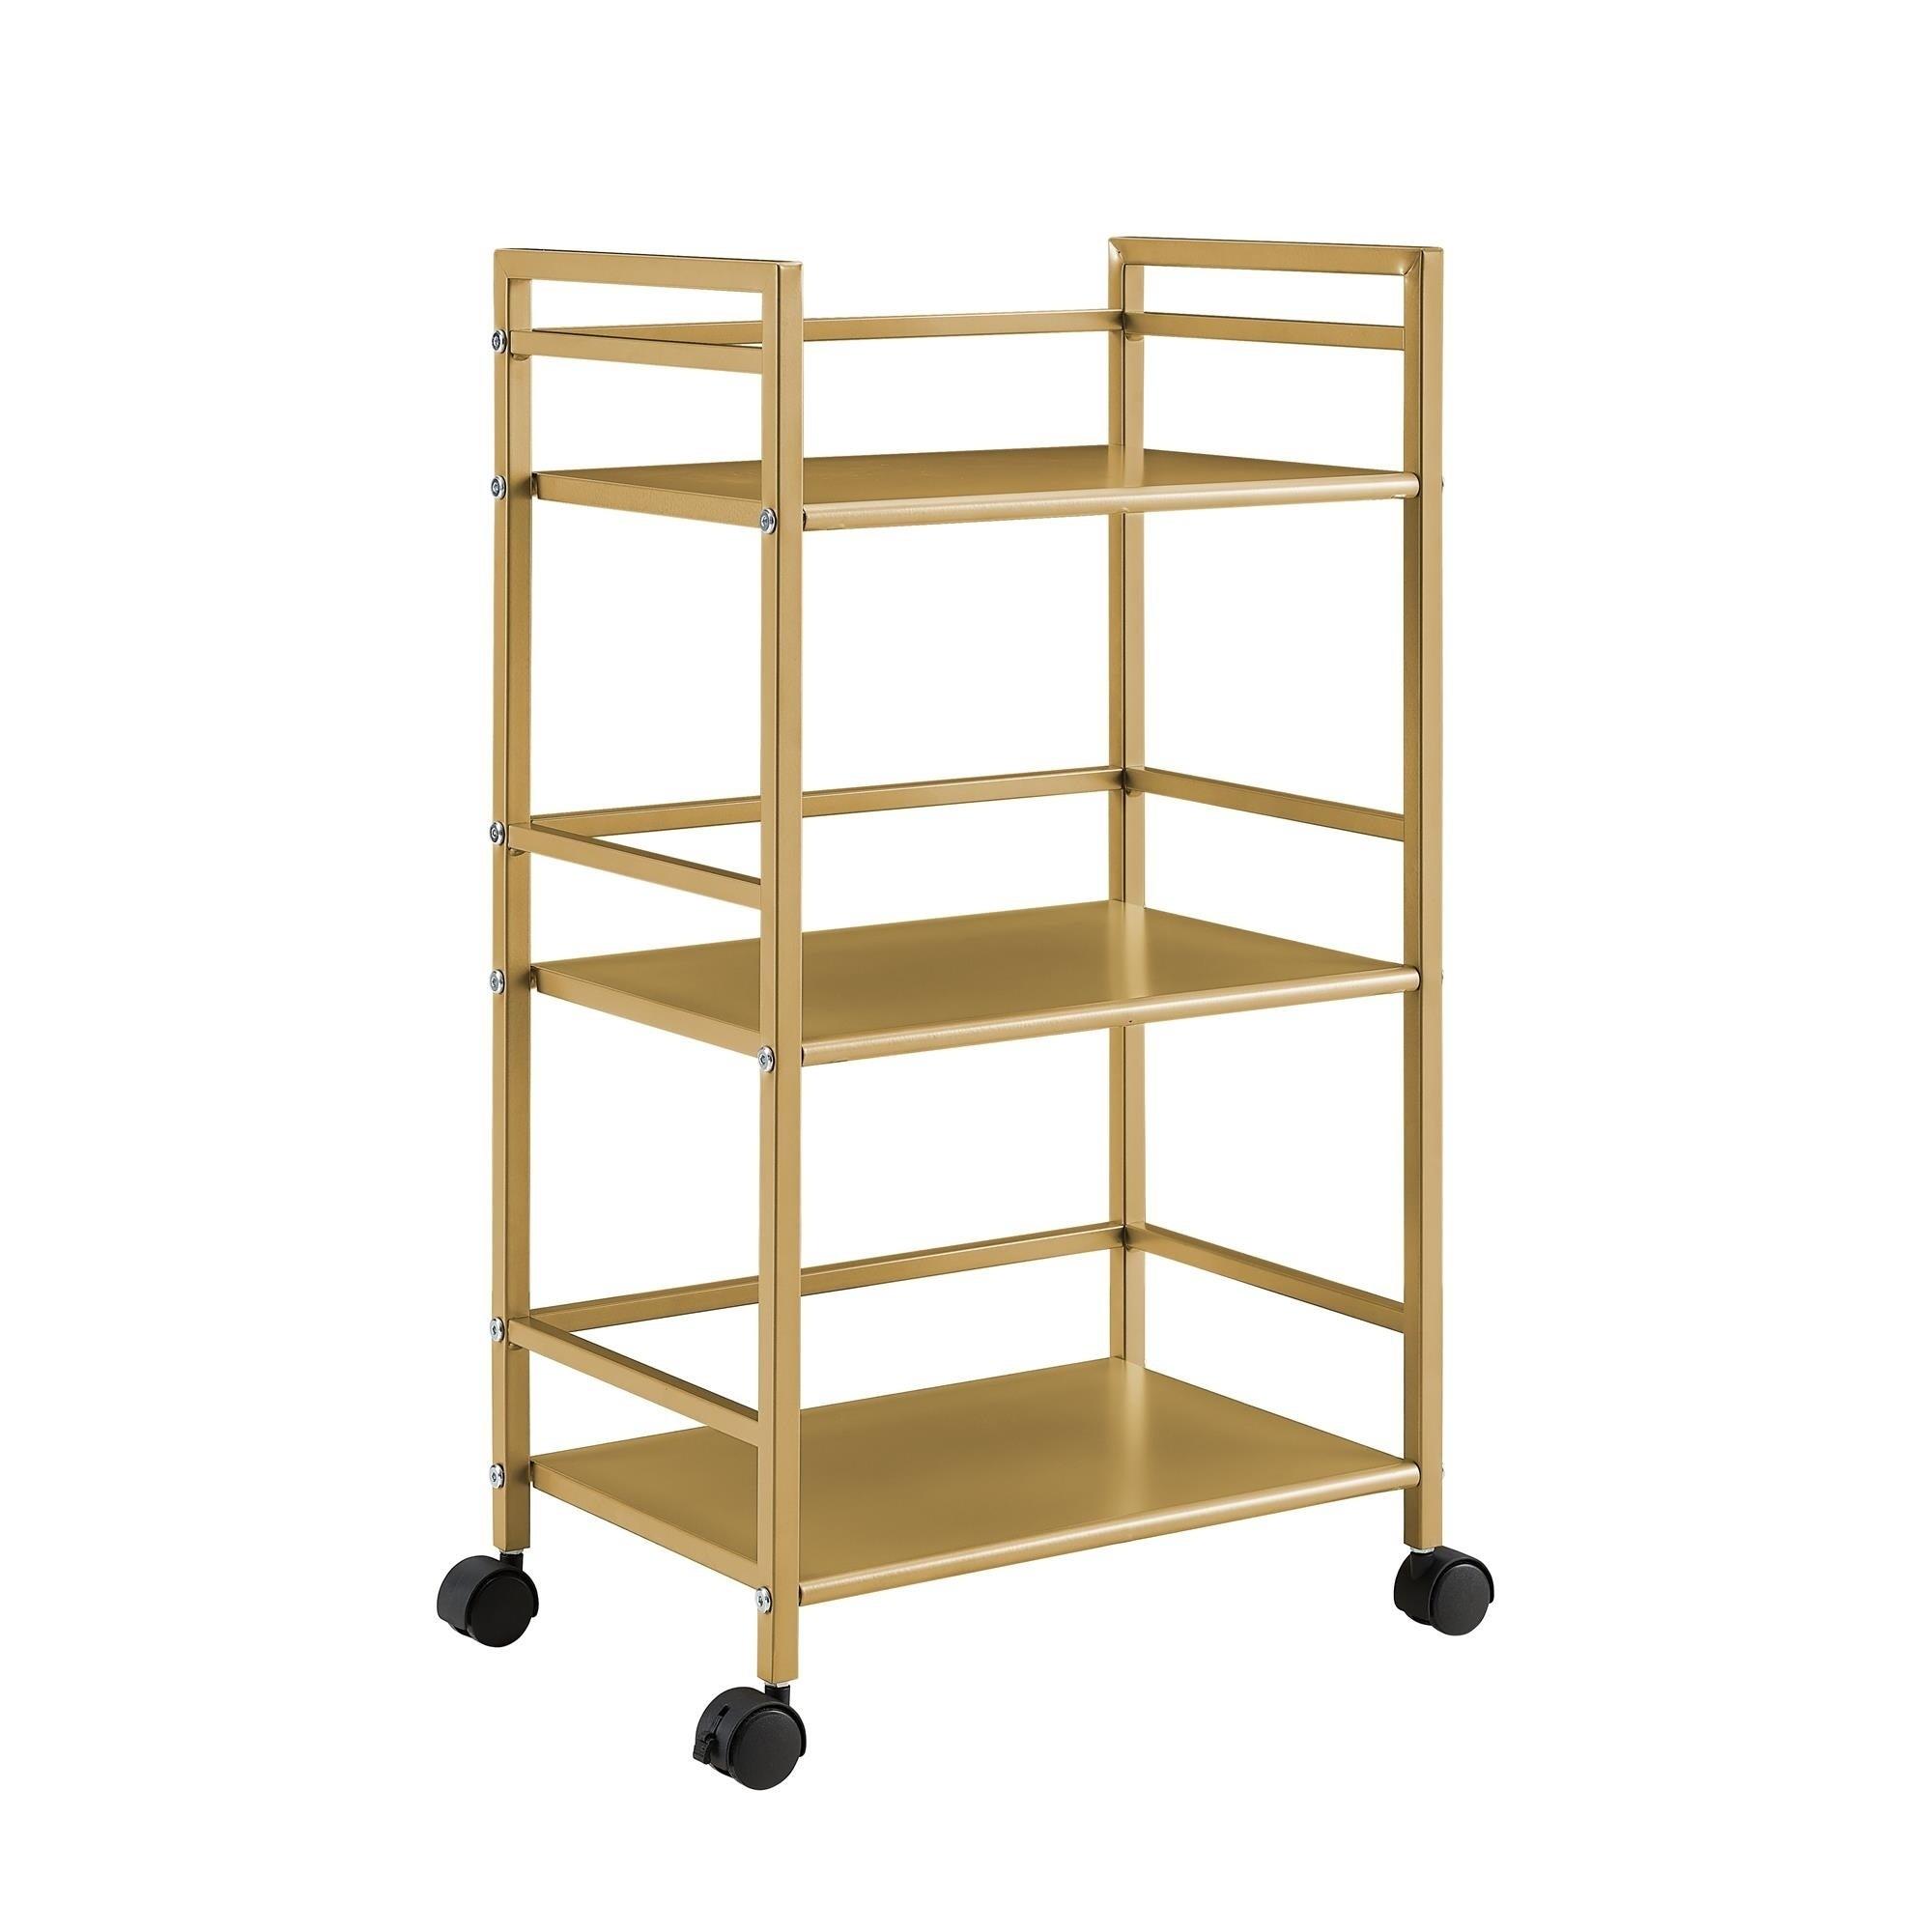 shop novogratz helix 3 shelf metal rolling utility cart in gold free shipping today overstockcom 22858850 - Rolling Utility Cart